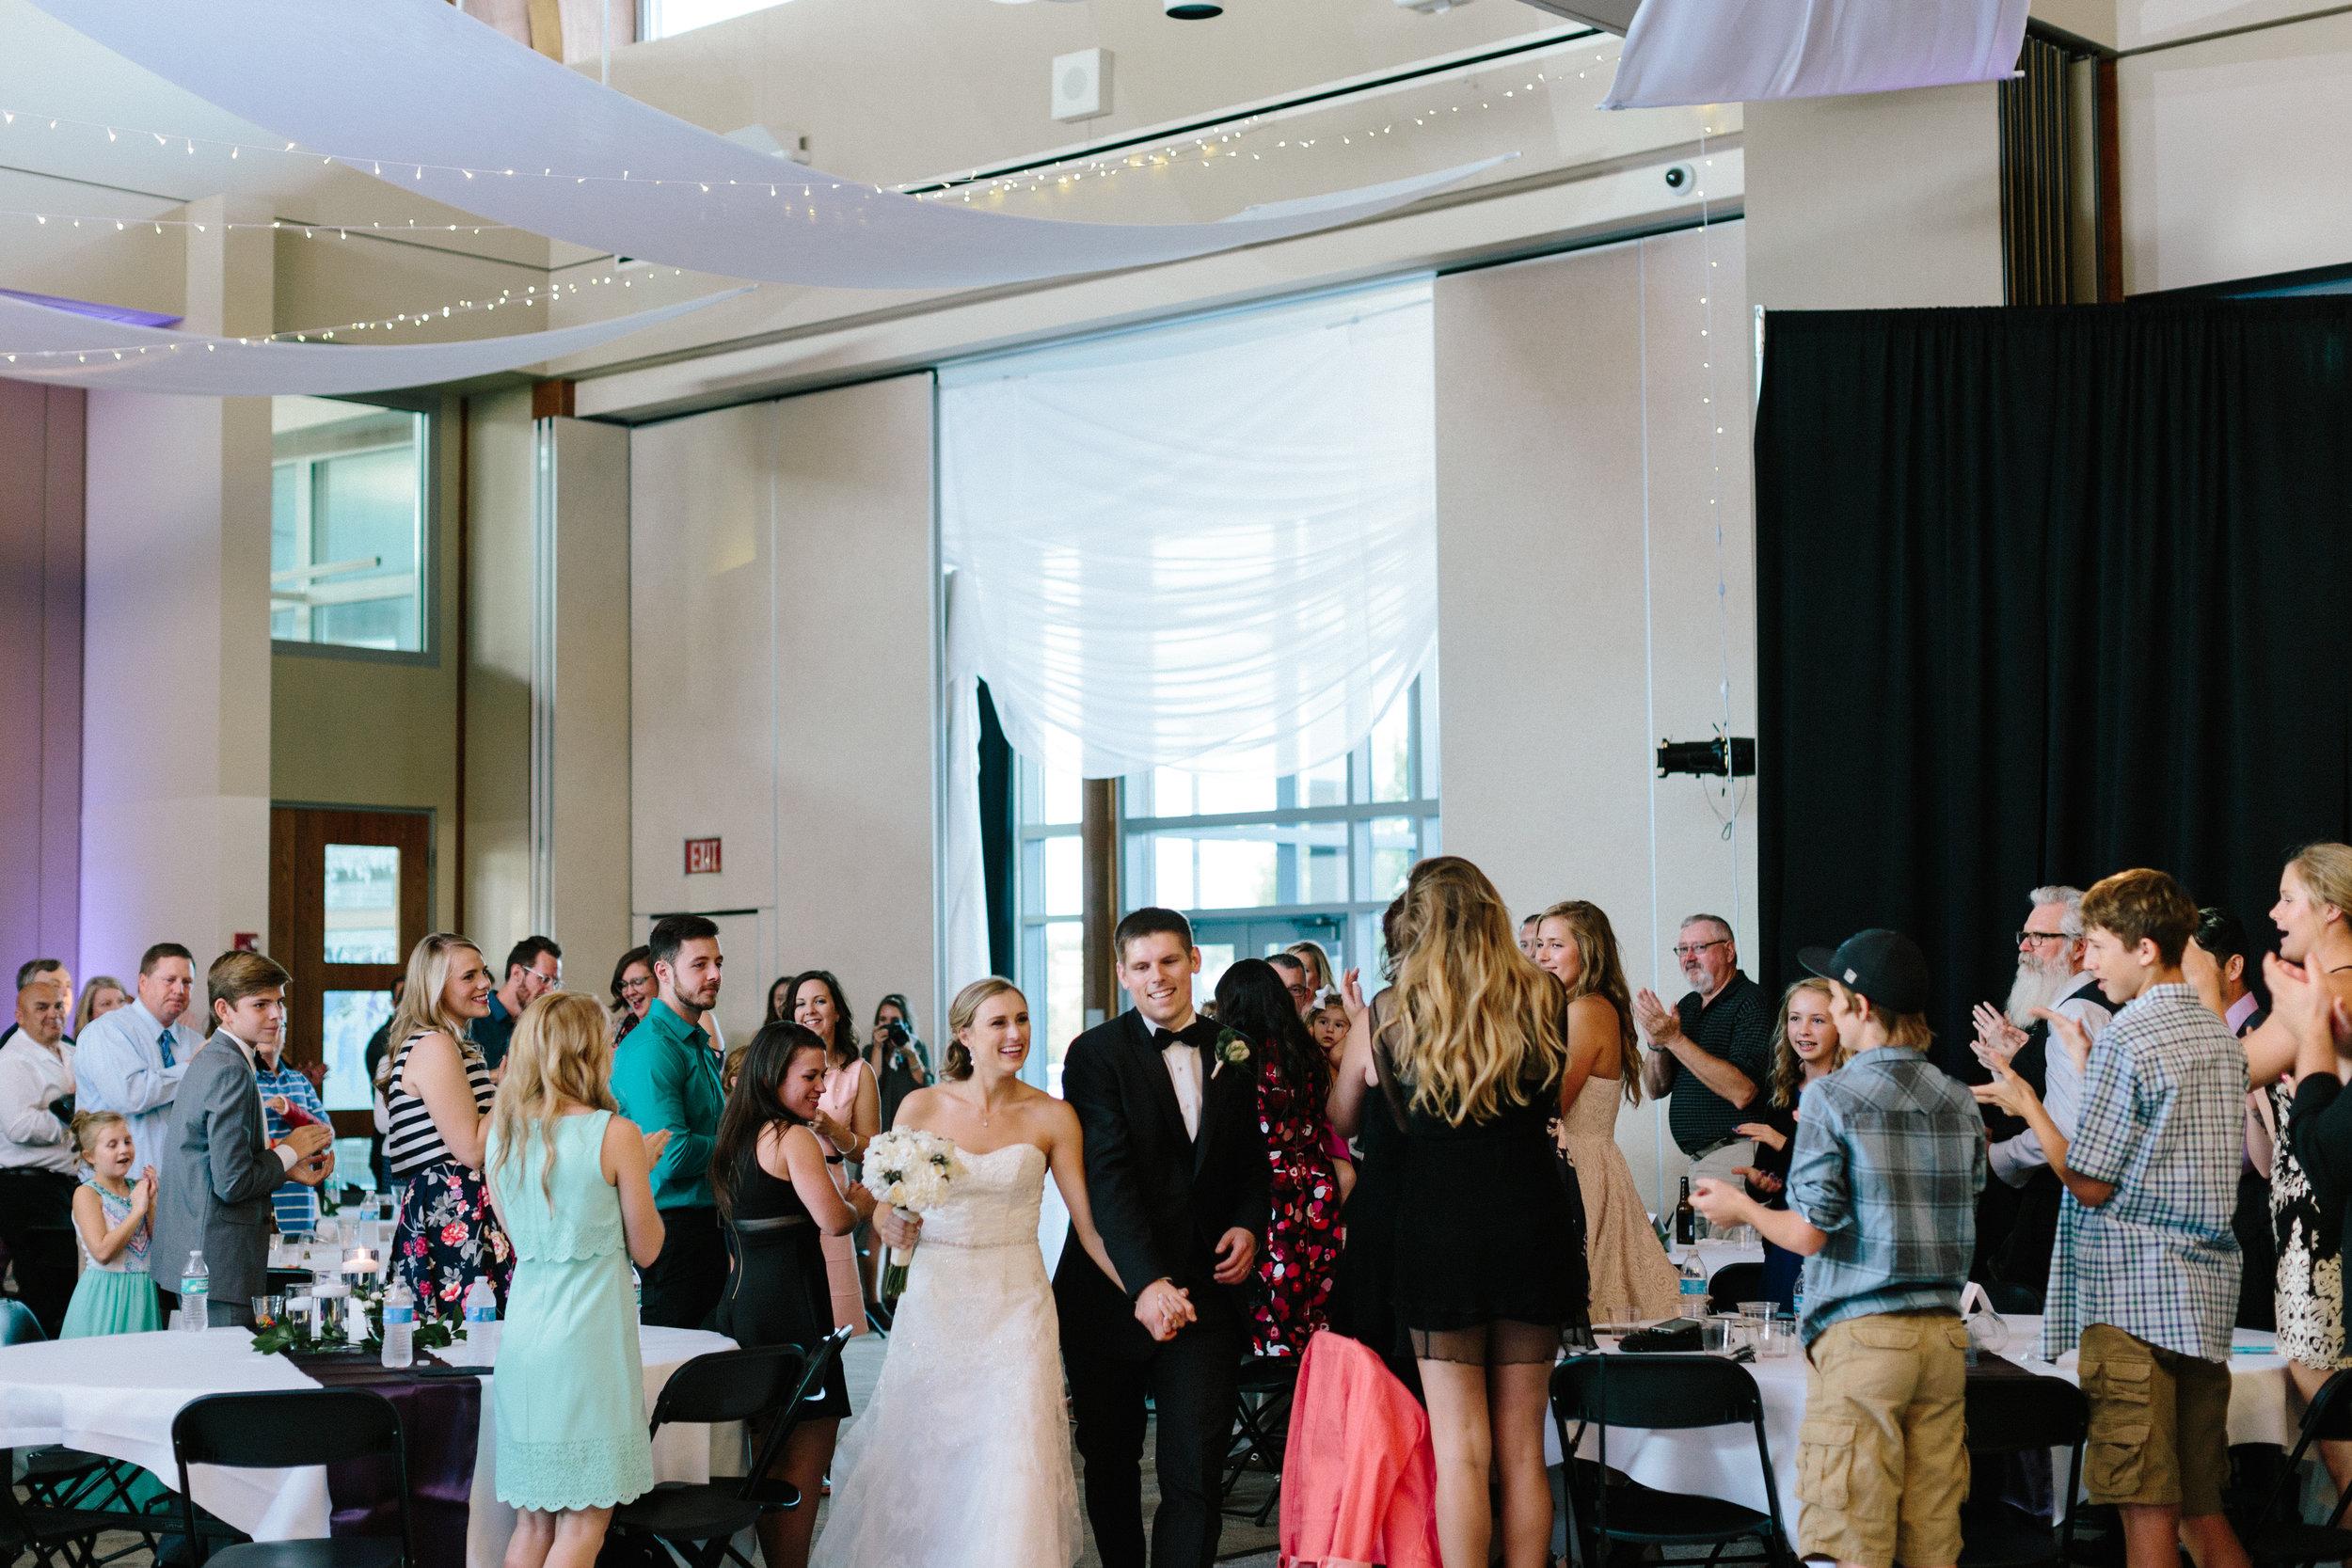 alyssa barletter photography kansas city wedding photographer katie and kendall-59.jpg